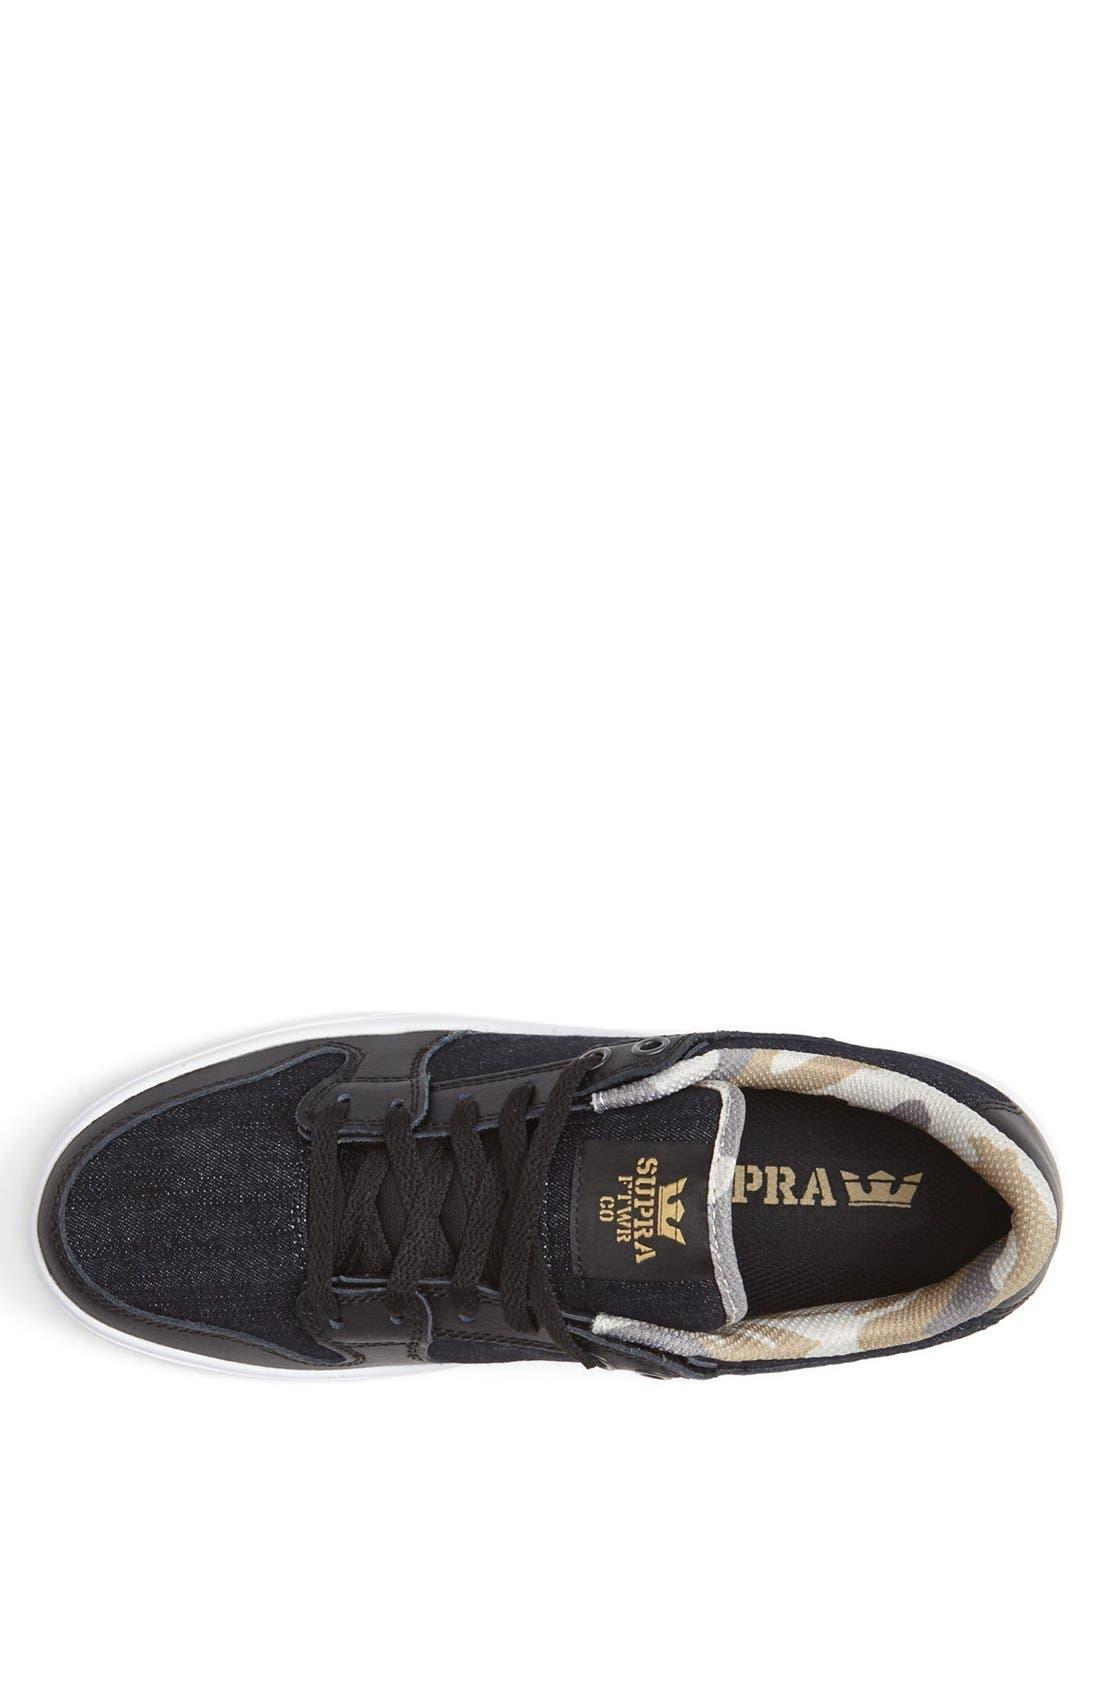 Alternate Image 3  - Supra 'Vaider LC' Sneaker (Men)